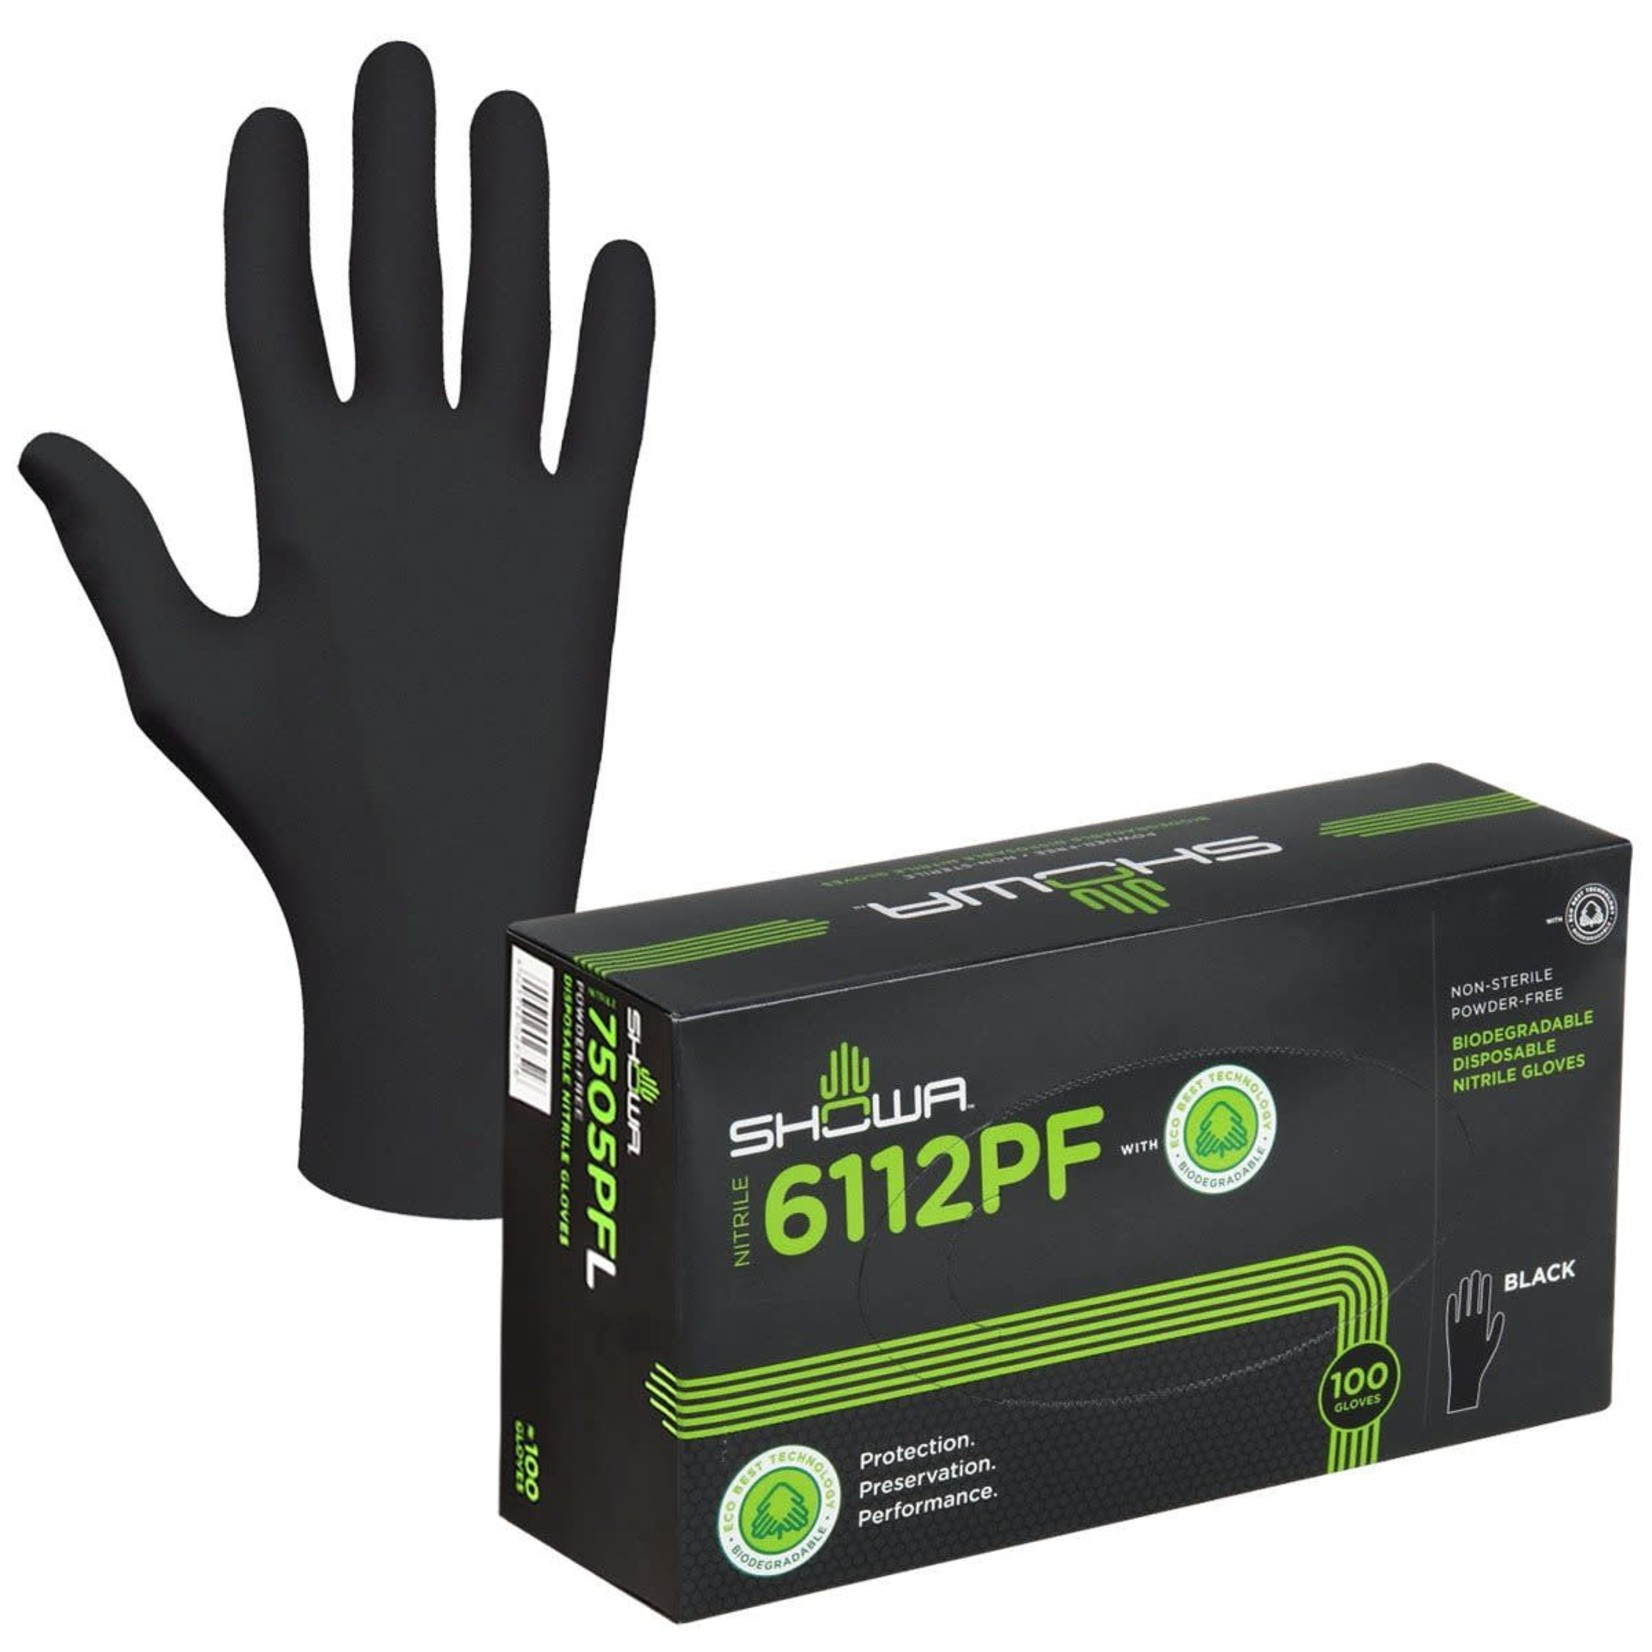 Showa Biodegradable Glove Large (100 / Bx)